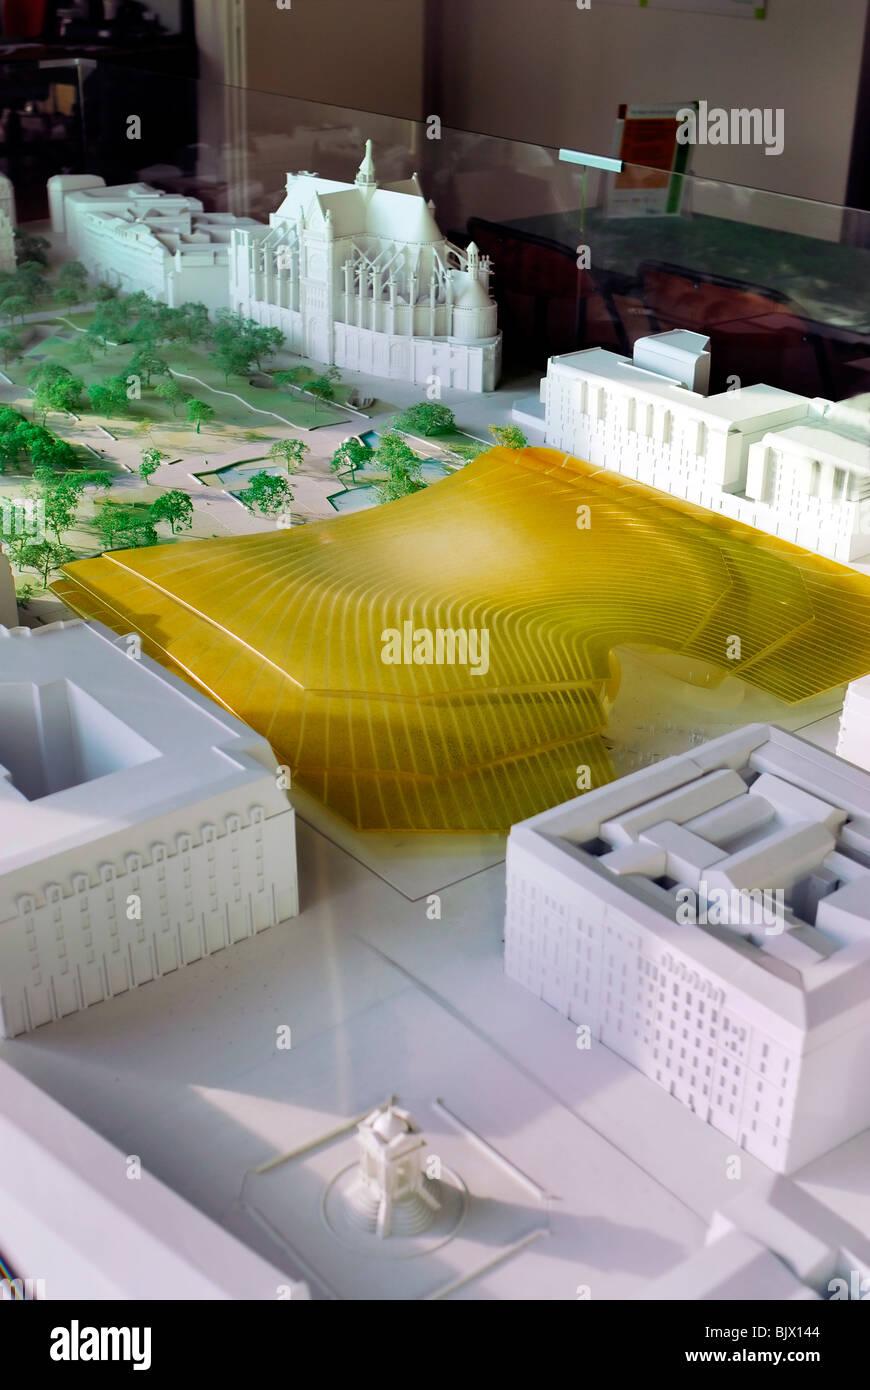 Paris, France, Architectural Model of the Les Halles 'Commercial Center' project, Design - Stock Image